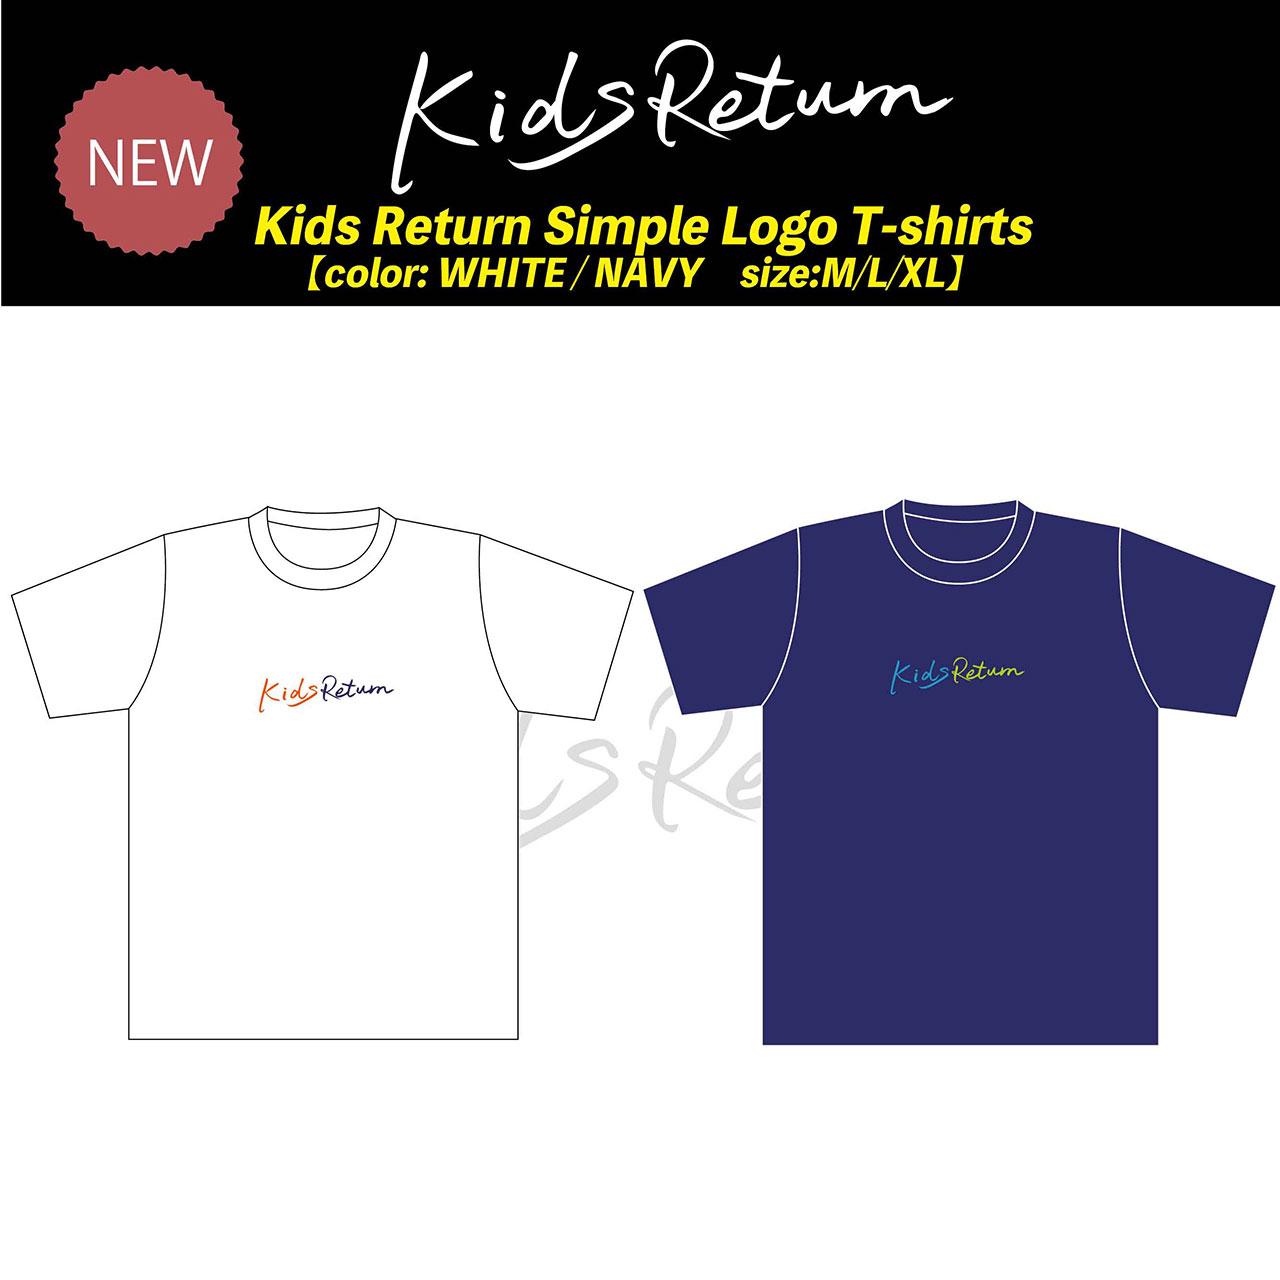 Kids Return SIMPLE LOGO T-Shirts